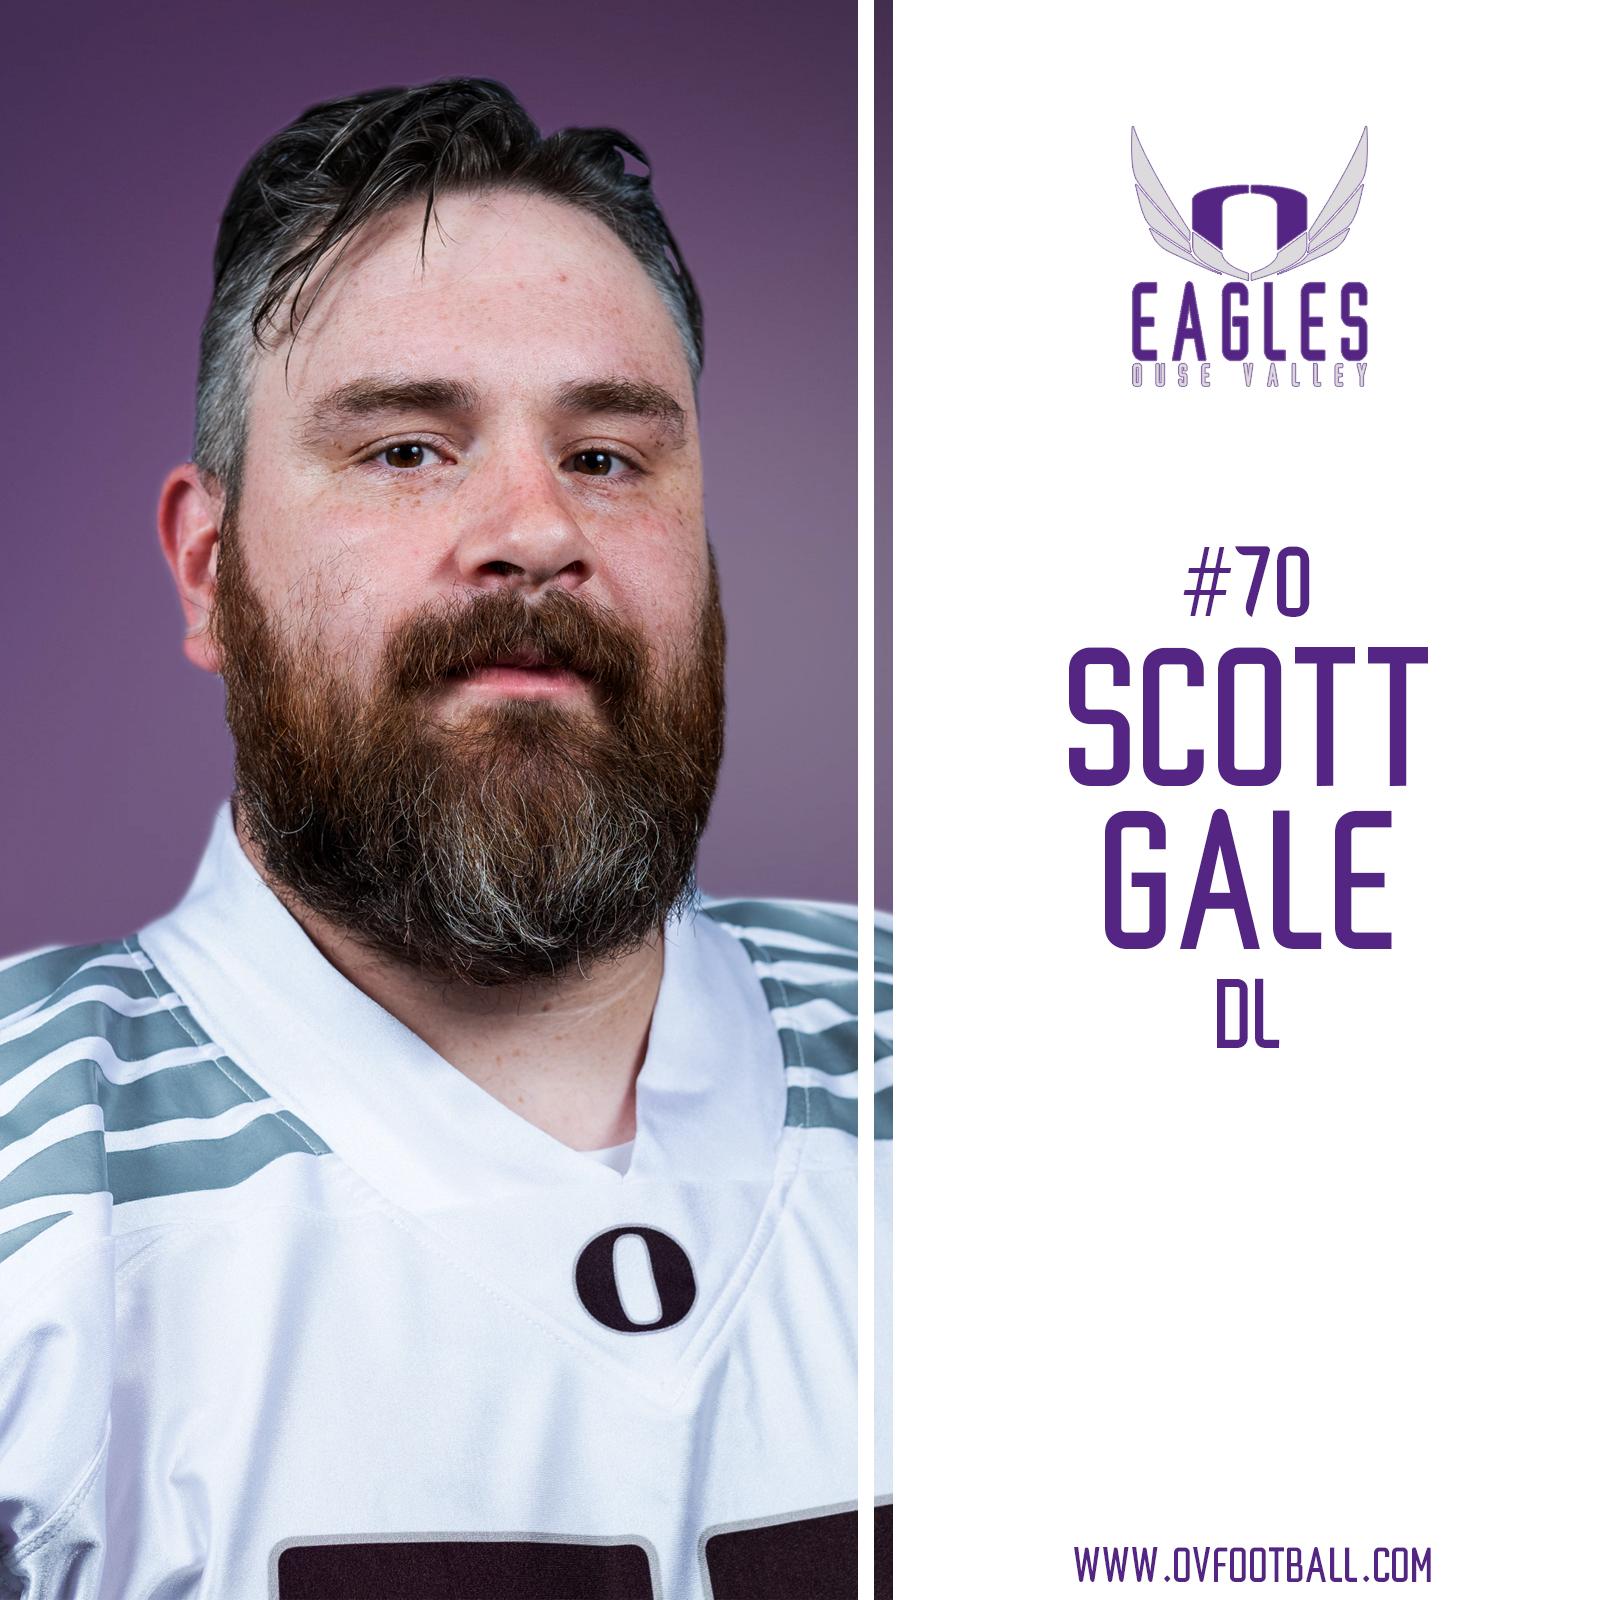 Scott-Gale.jpg